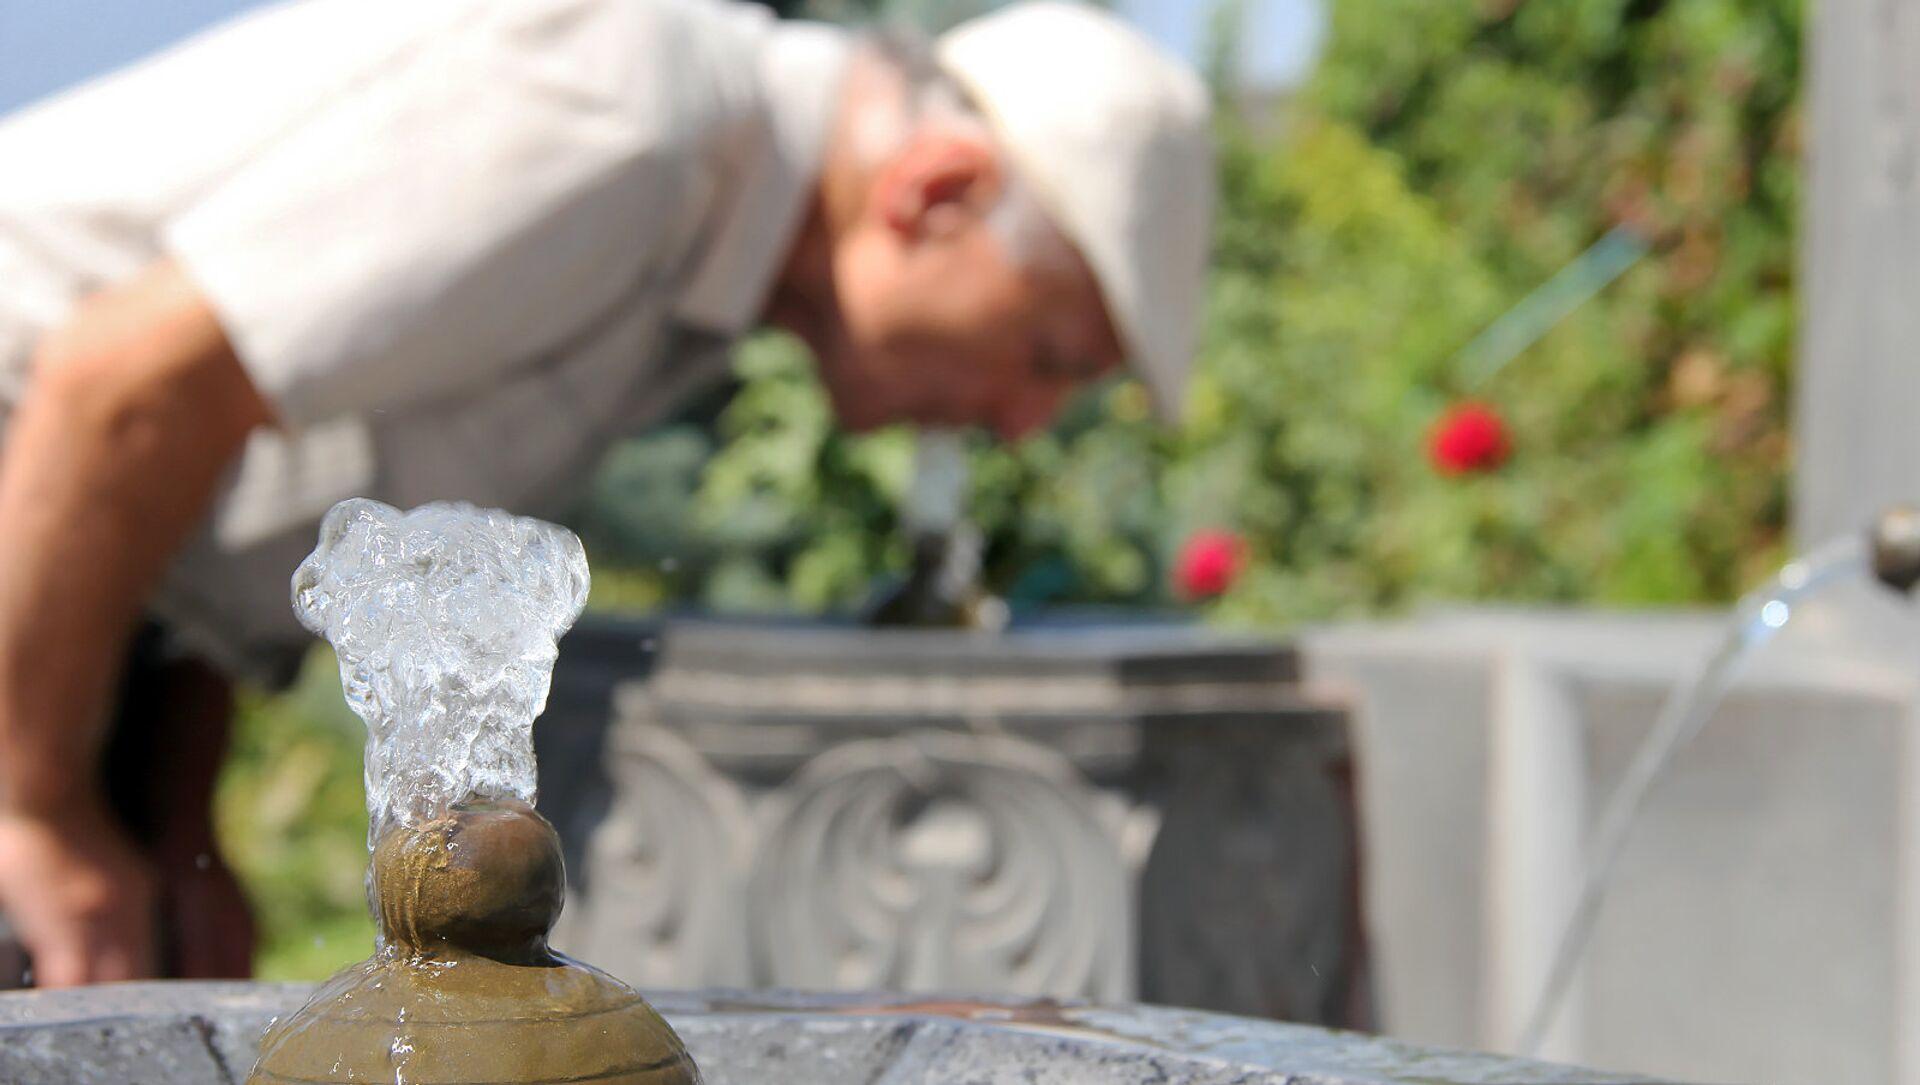 Питьевой фонтанчик - Sputnik Արմենիա, 1920, 23.08.2021